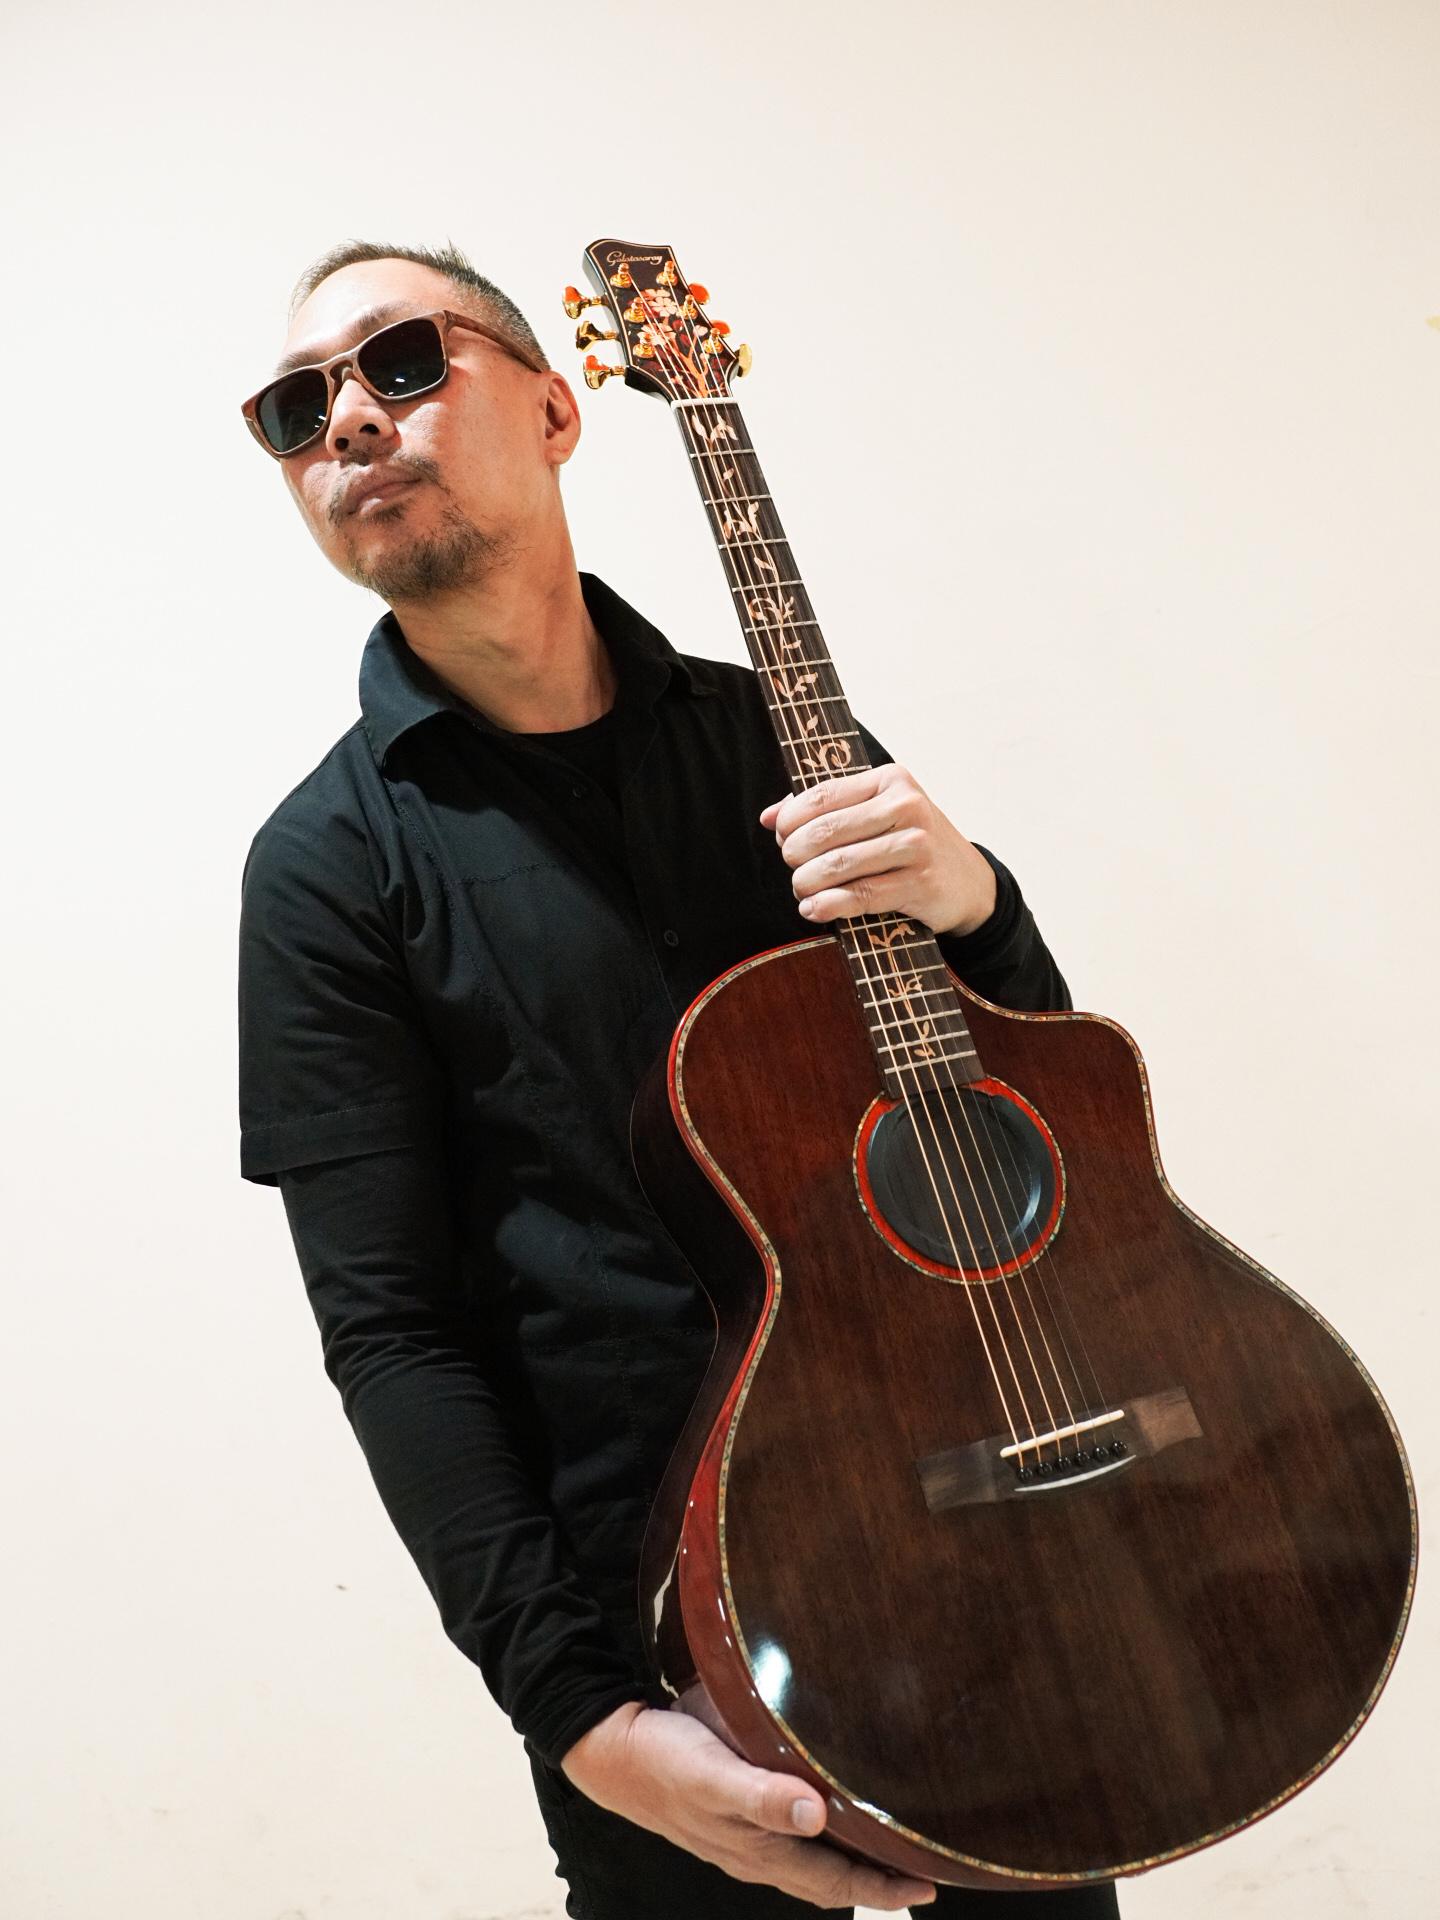 EDWIN MARSHAL RILIS SINGLE SOLO KEDUA